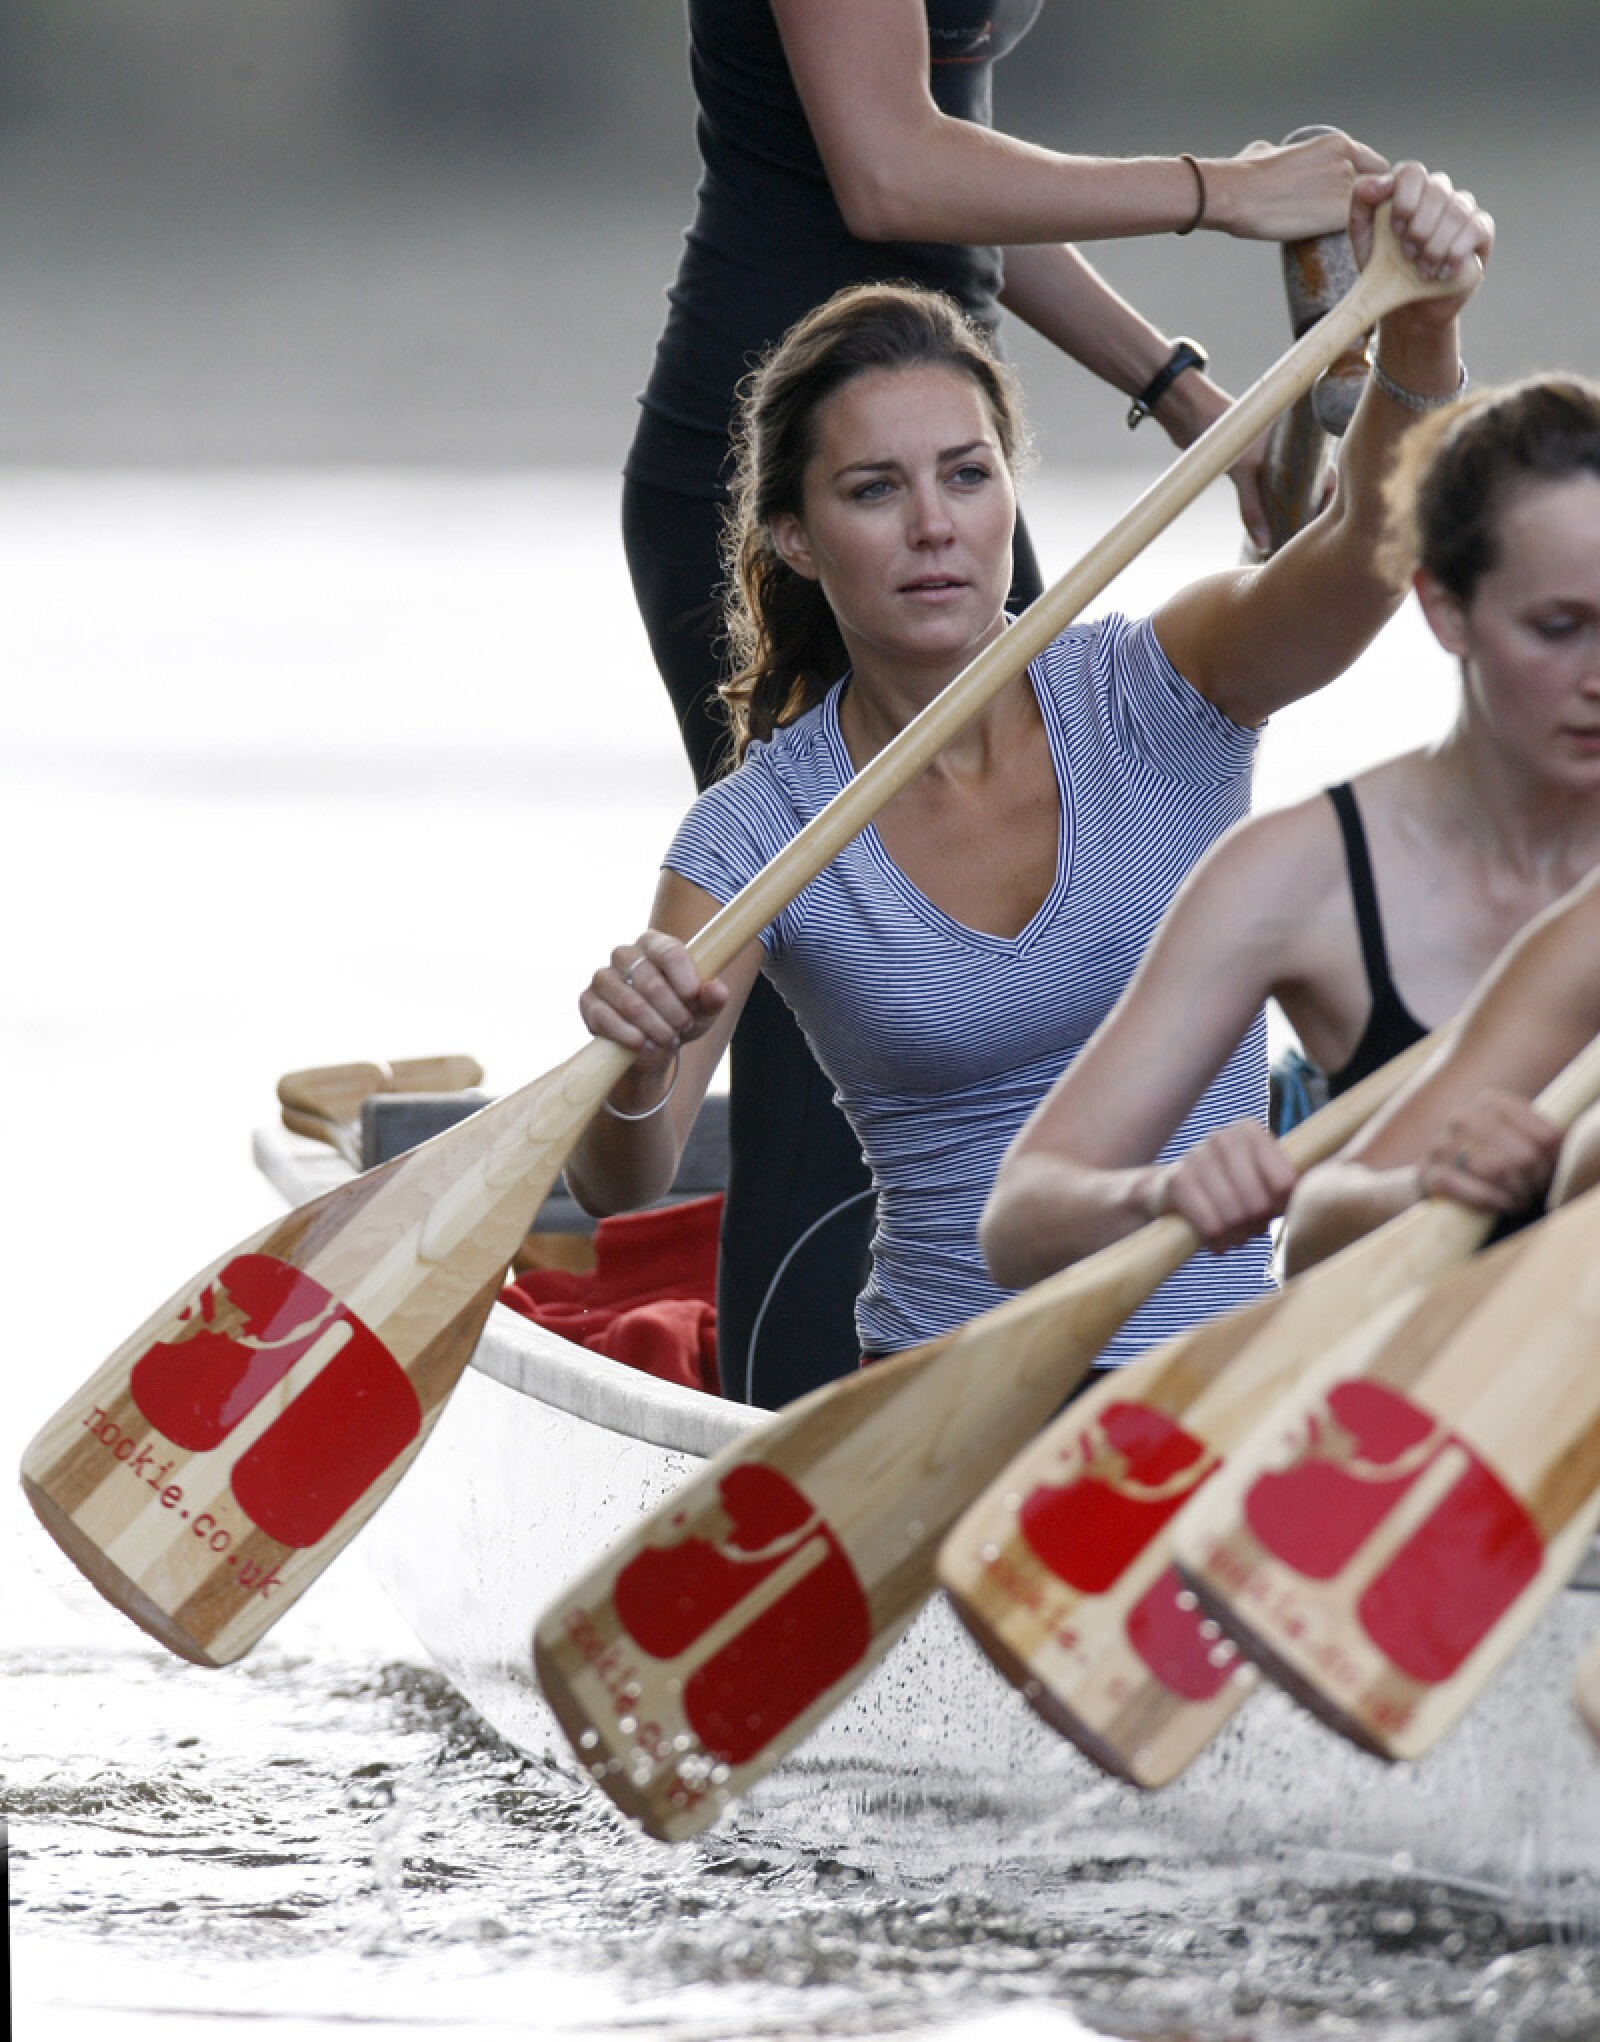 Kate Middleton training for 'The Sisterhood Challenge' on the River Thames, London, Britain - 27 Jul 2007